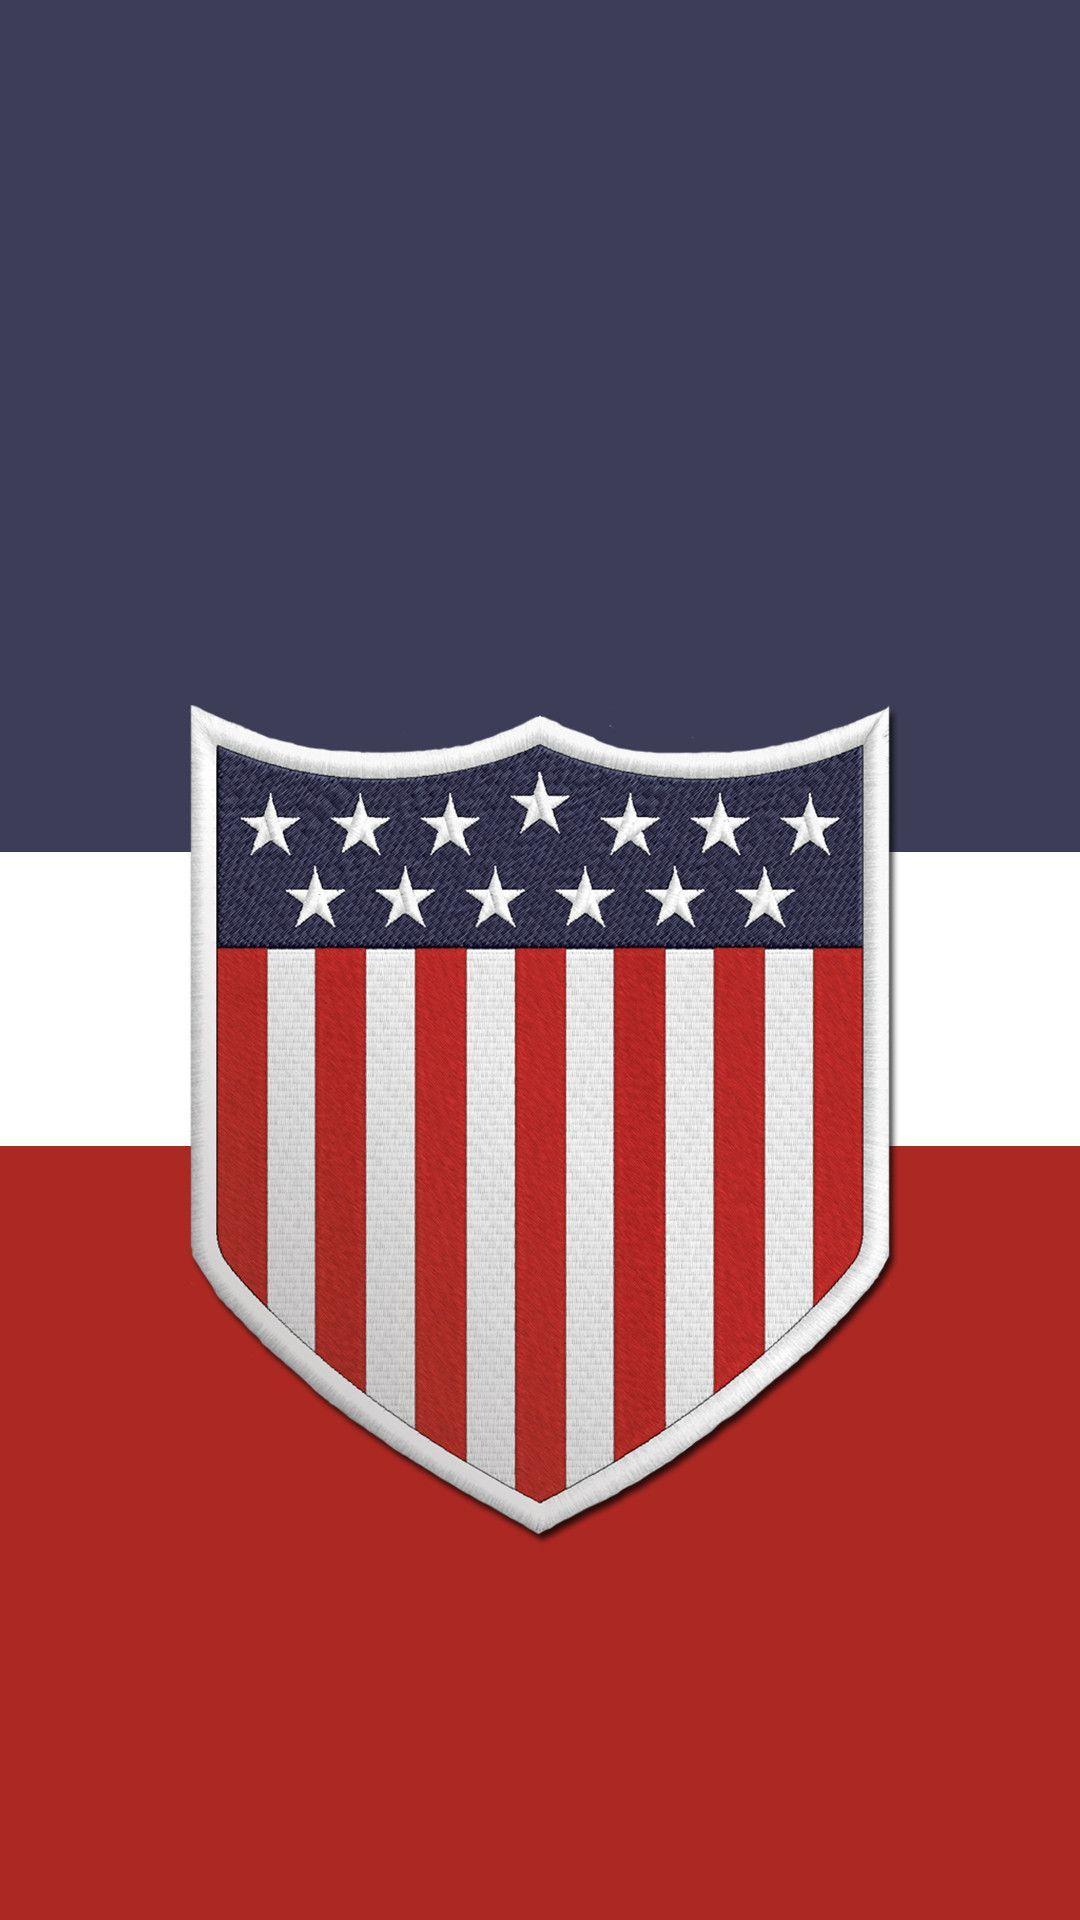 45 U S Soccer Wallpapers Download At Wallpaperbro